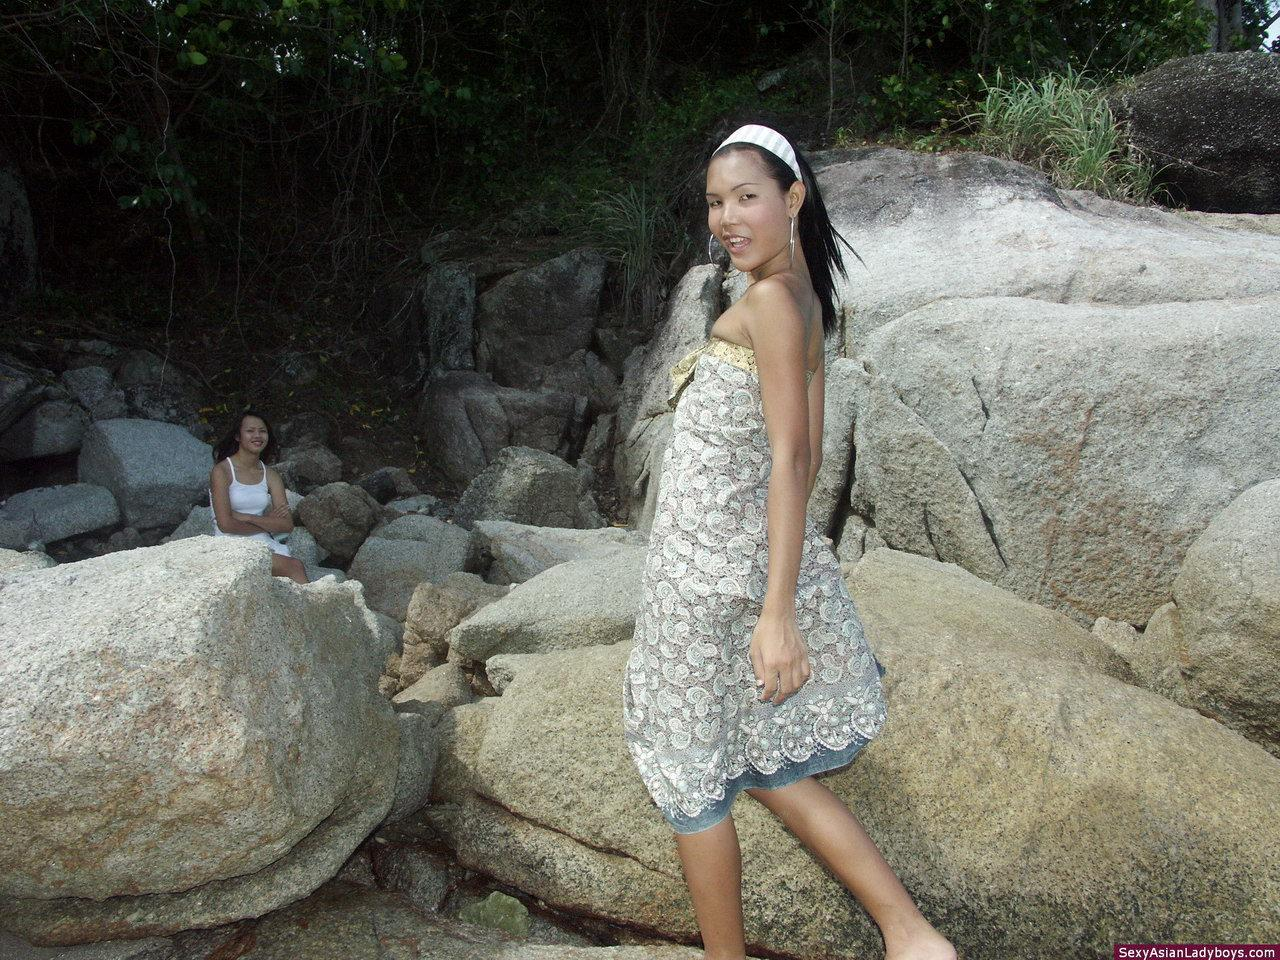 Little Tgirl Shows Her Skinny Figure